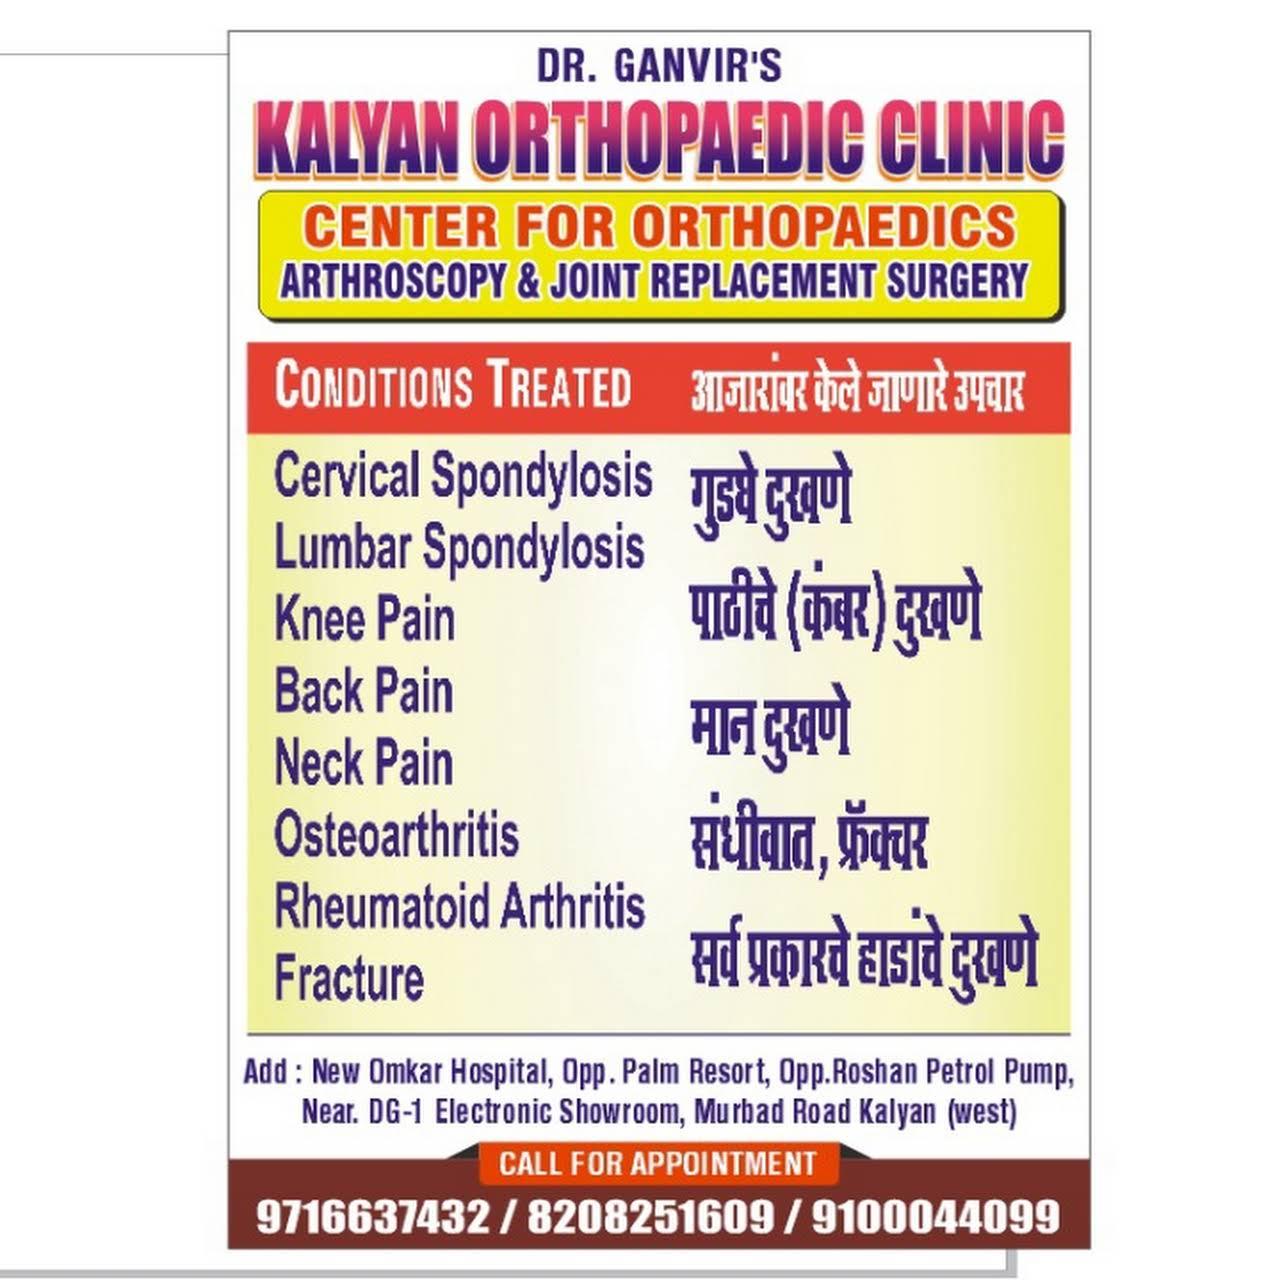 kalyan orthopedic clinicdr.ganvir   Best Orthopedic Surgeon in ...